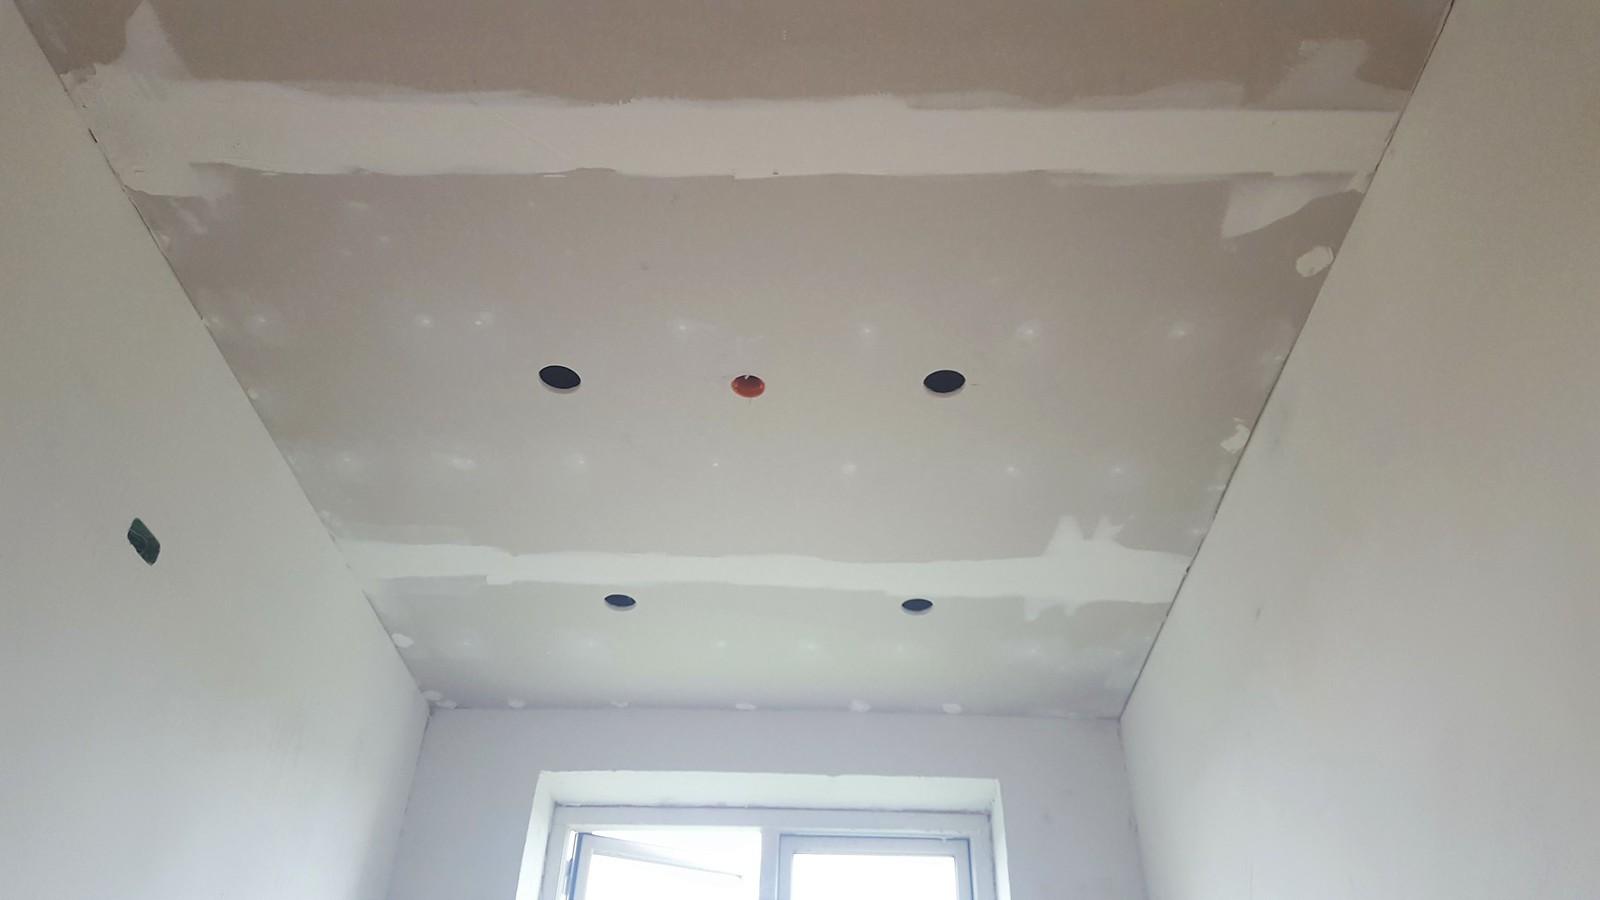 Installing LED Down Lights